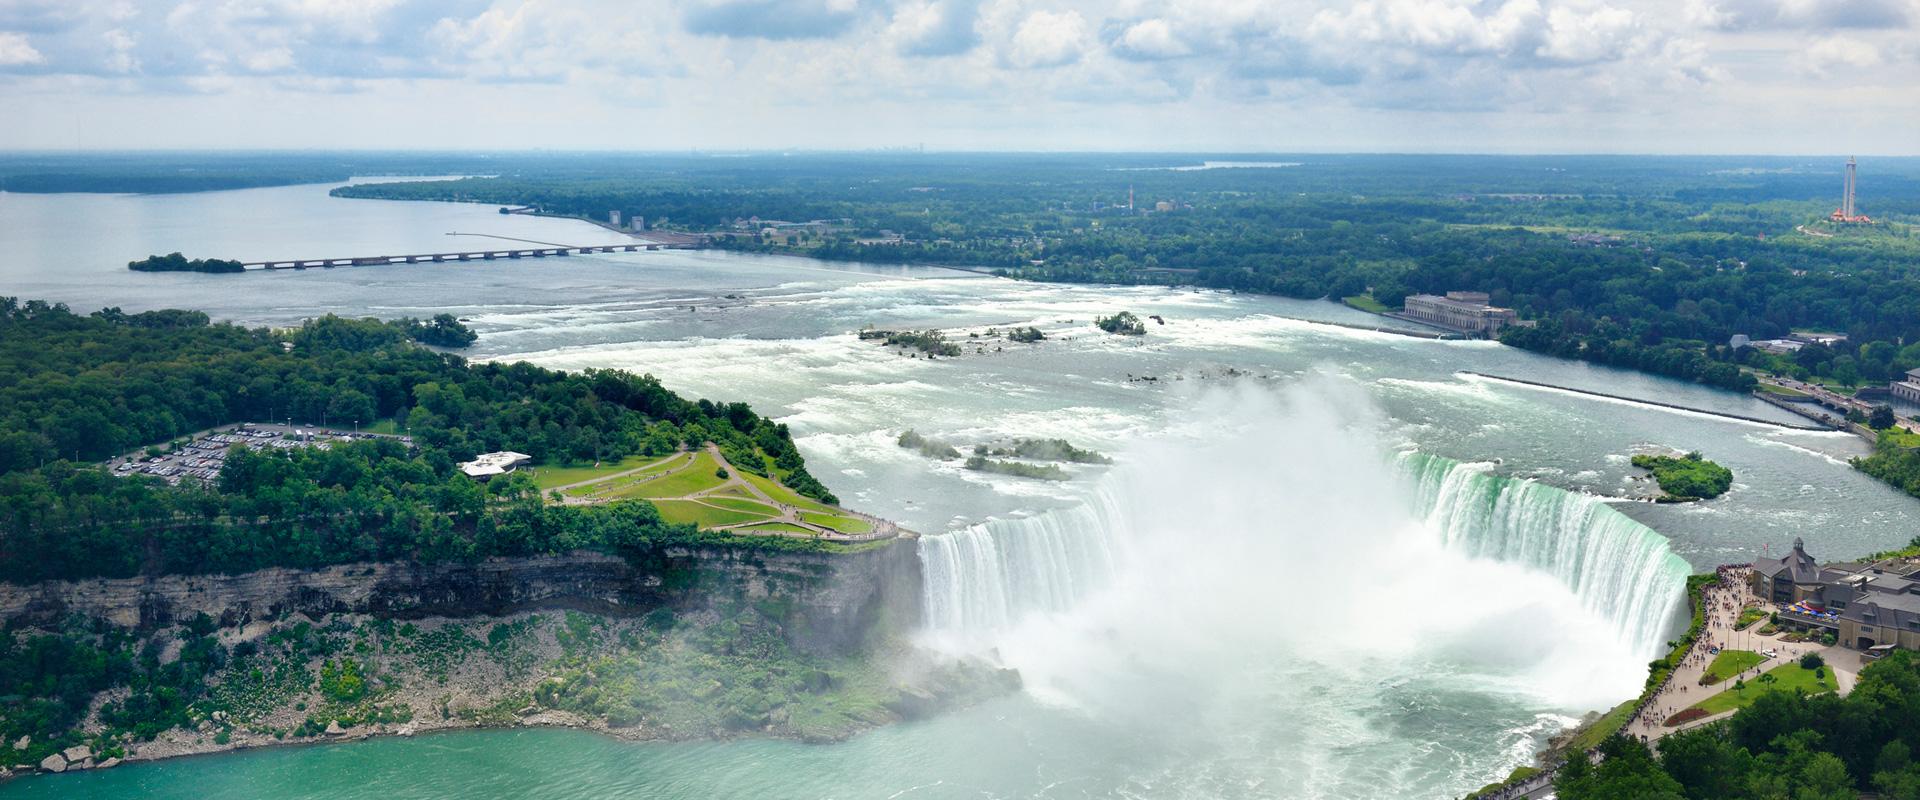 Niagara Falls Tourism Information